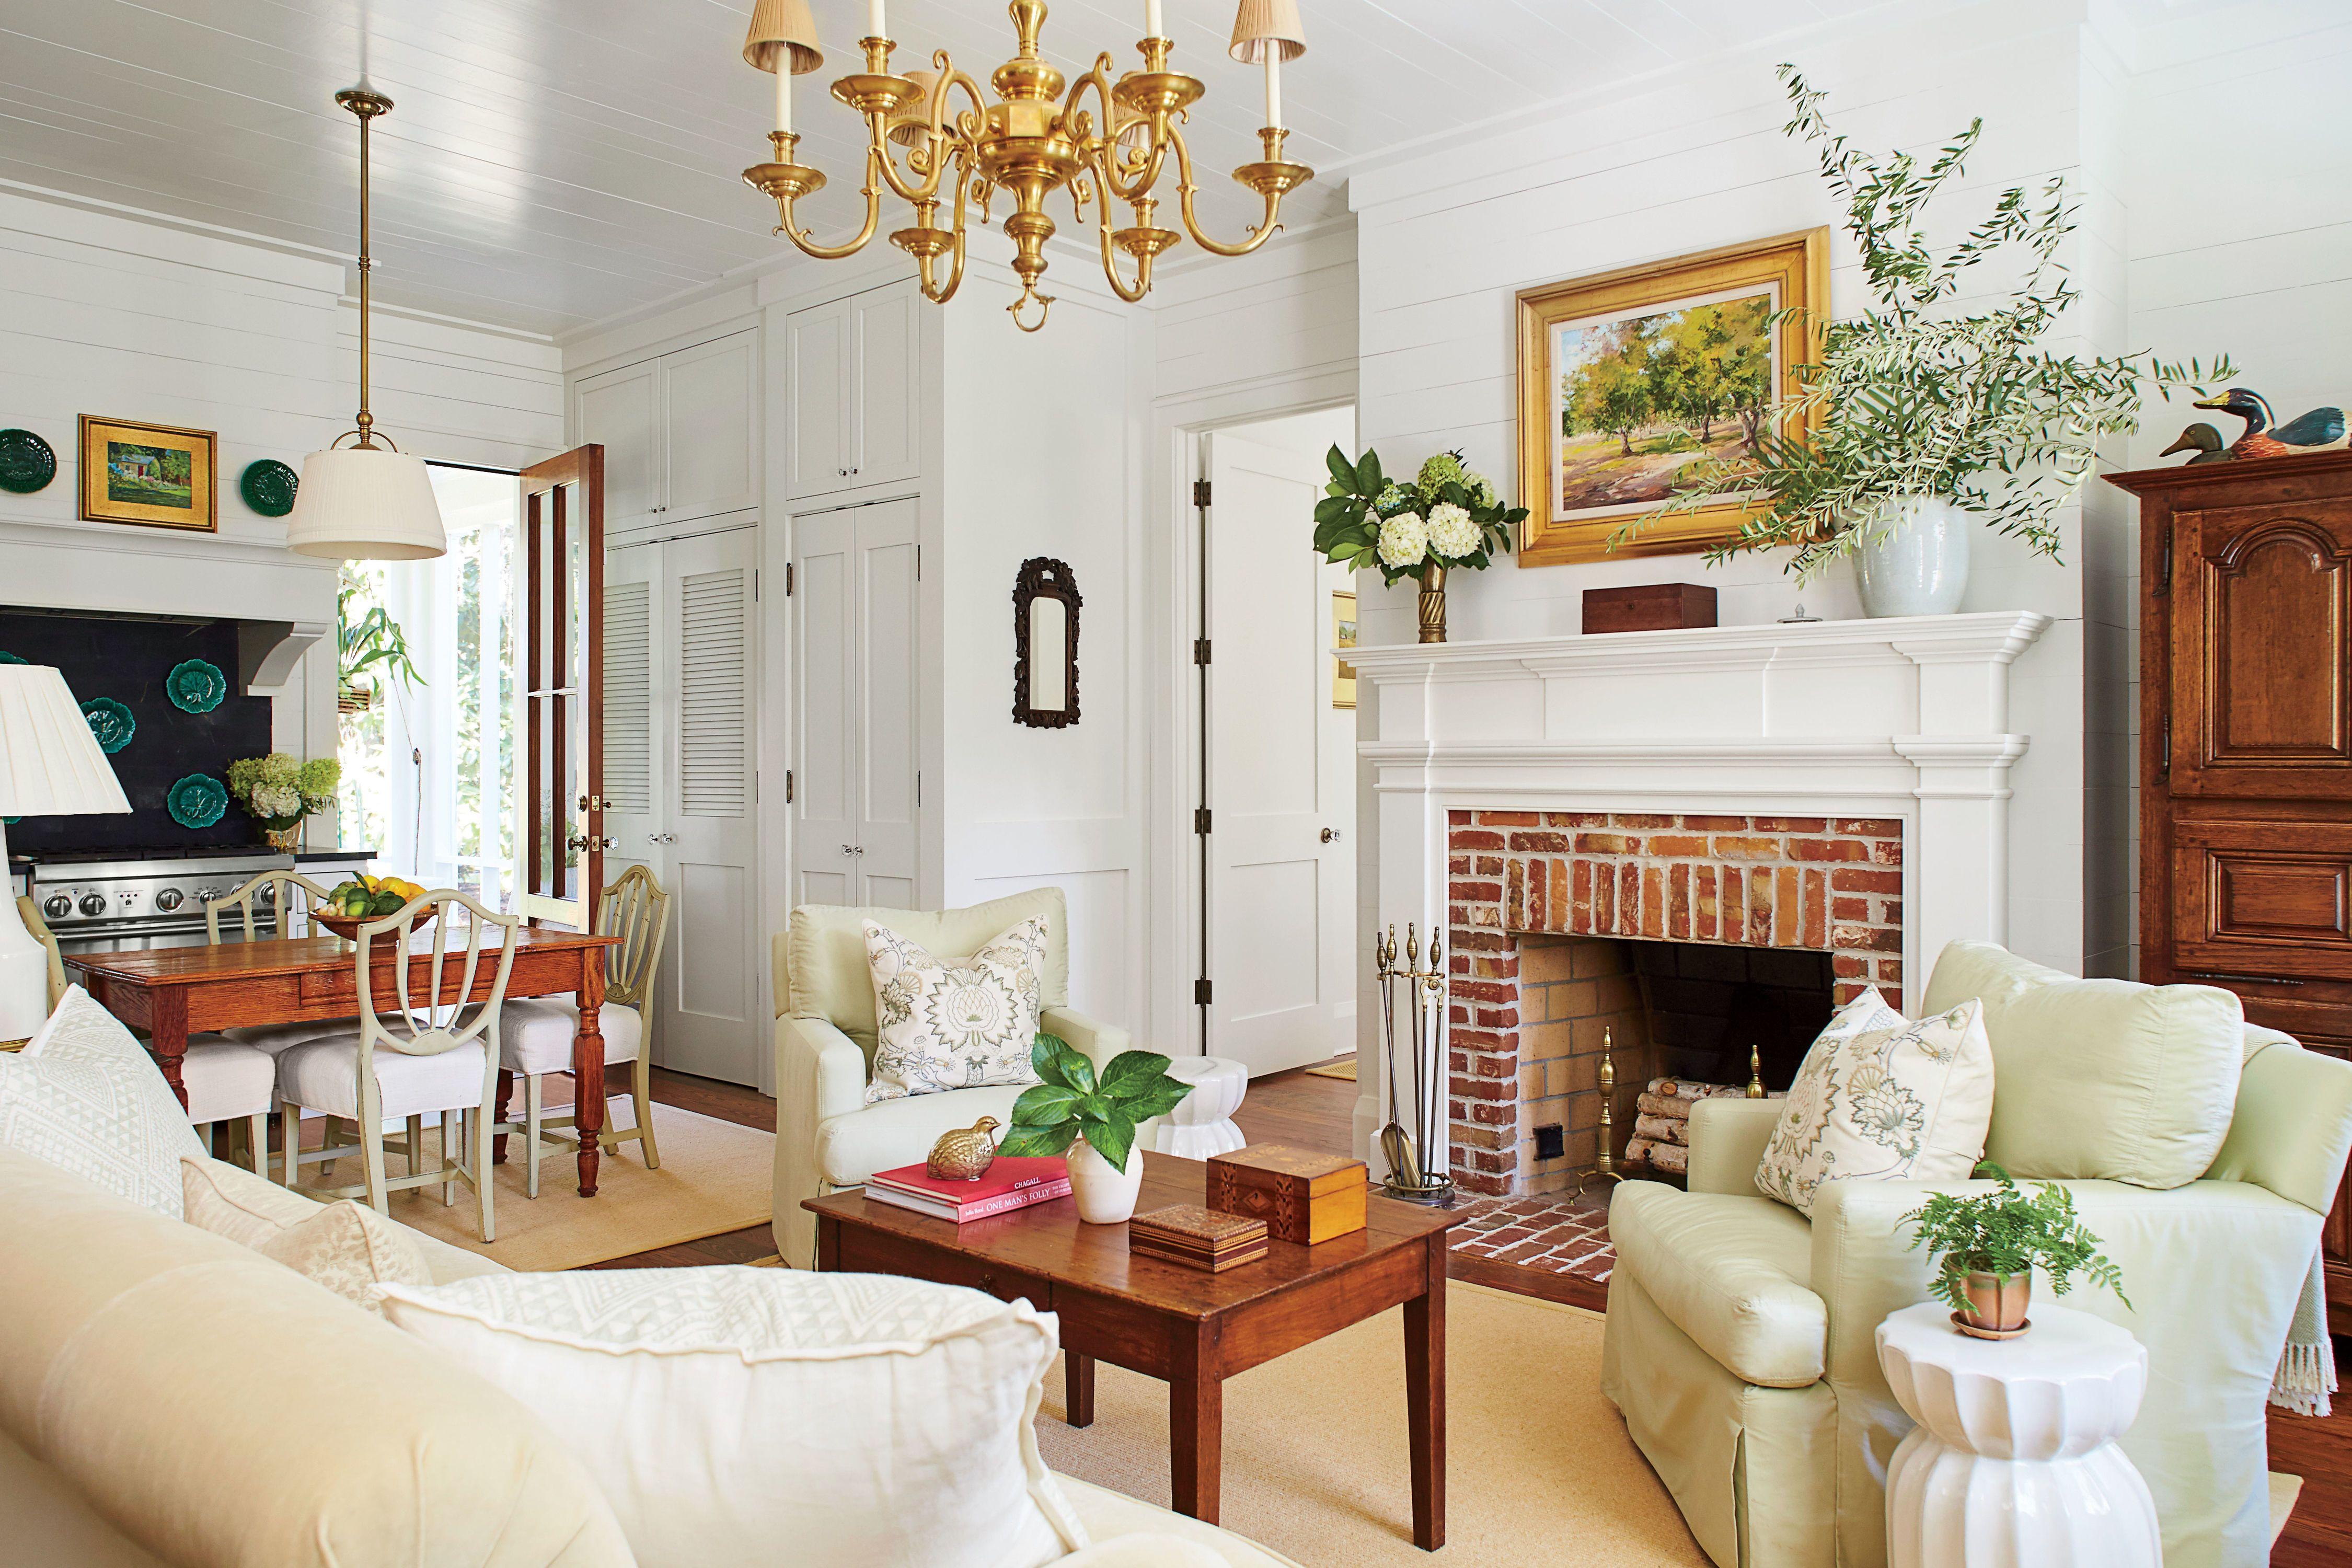 Brandon Ingram Florida Cottage | Home | Pinterest | Tiny houses ...